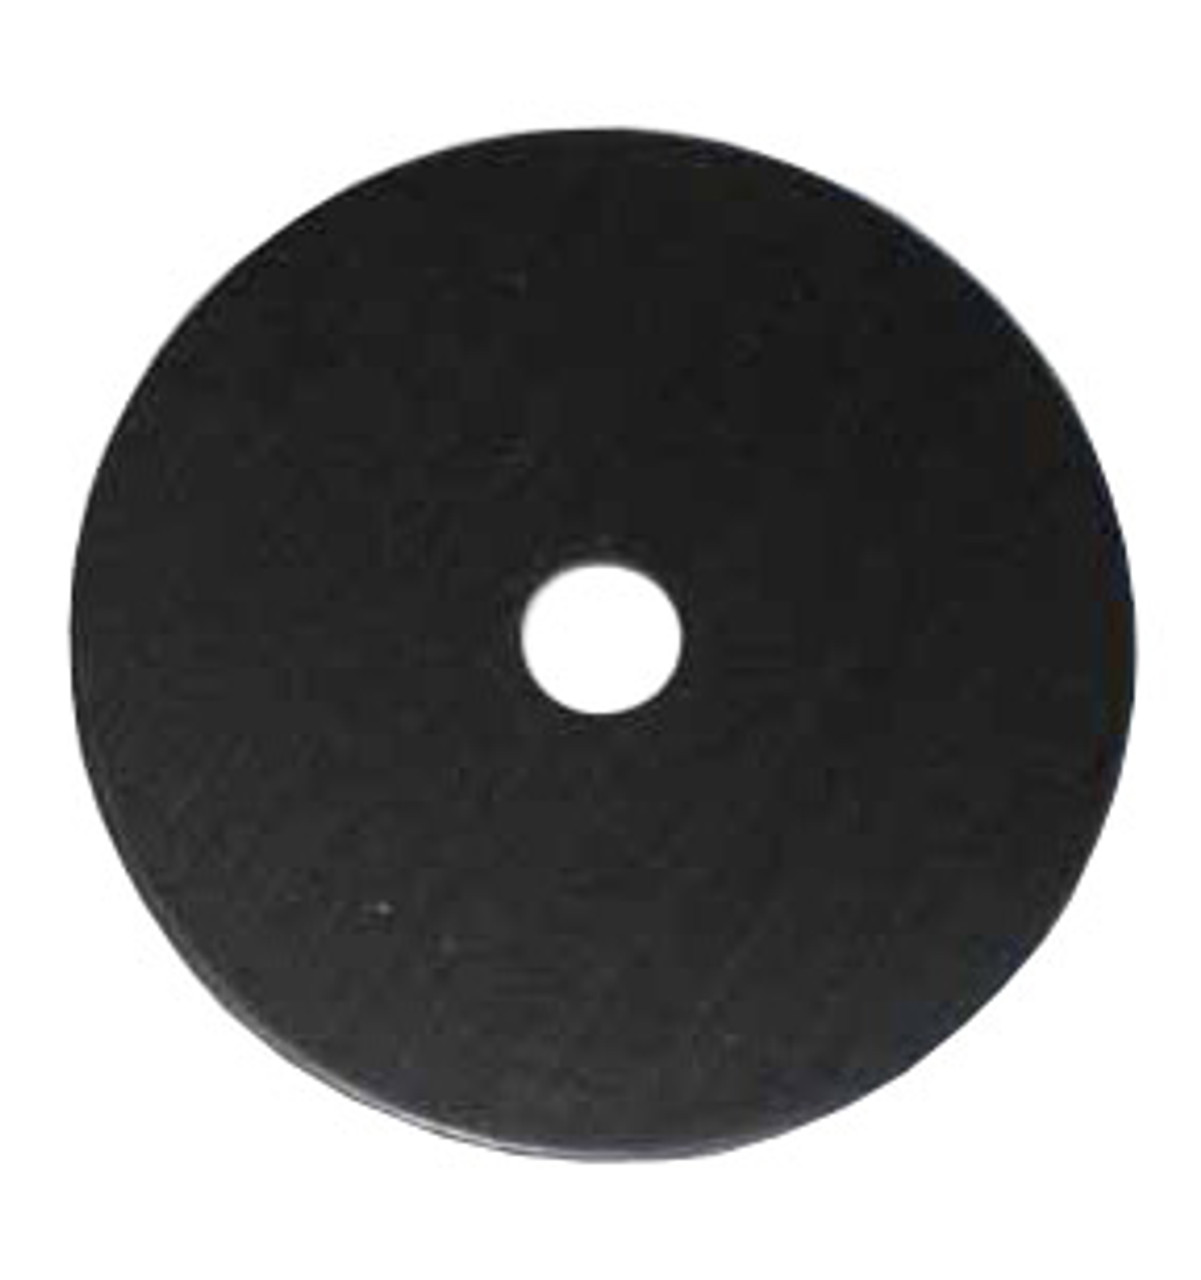 P/N STZ0125: Aluminum Flat Seat Washer, Black